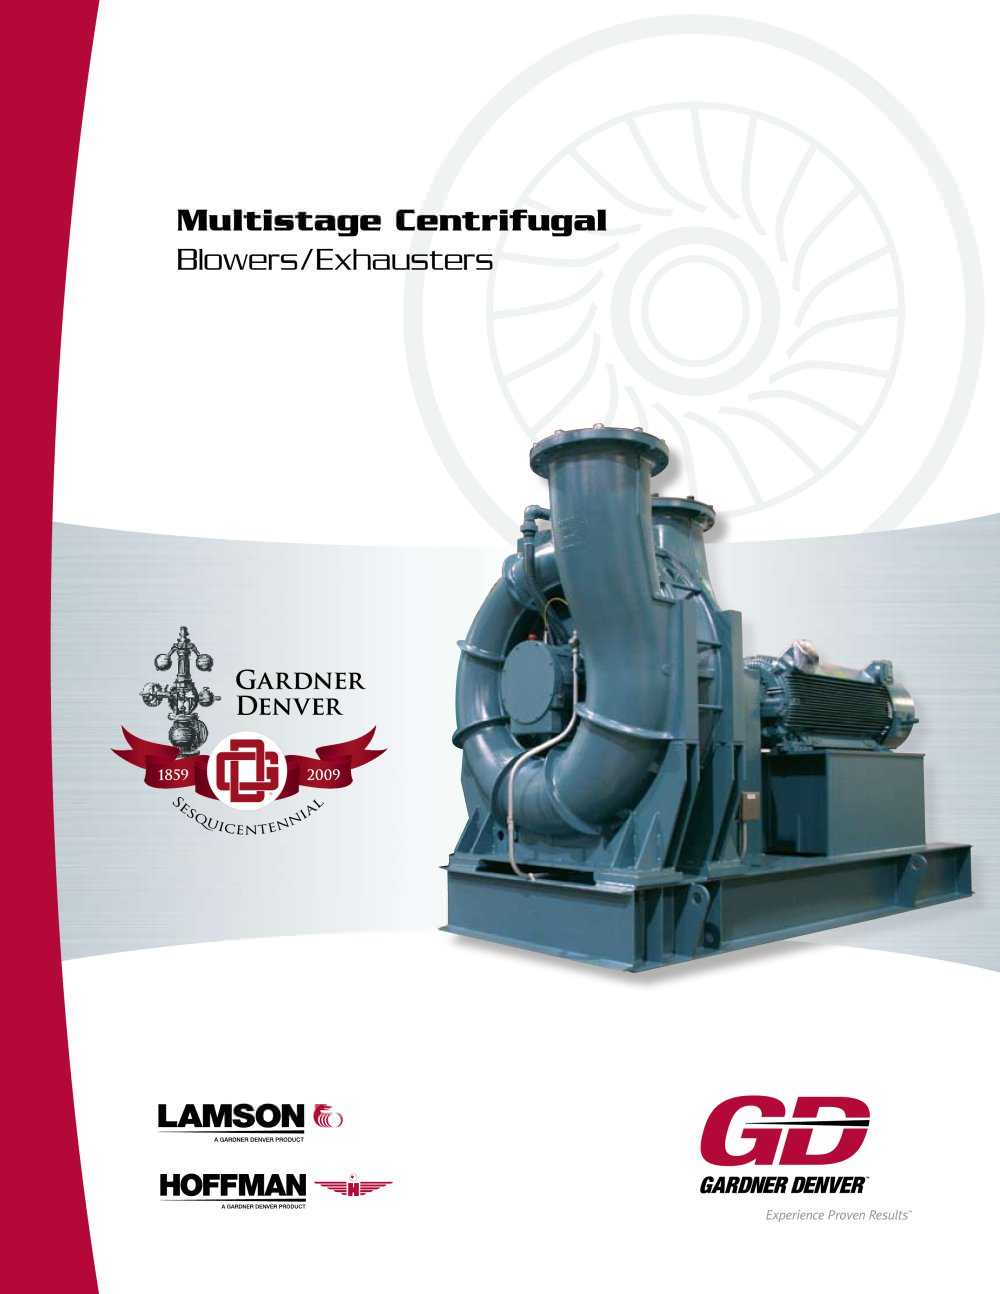 multistage centrifugal blowers exhausters hoffman lamson pdf rh pdf directindustry com Gardner Denver Blower Vacuum Pump Gardner Denver Blower Vacuum Pump